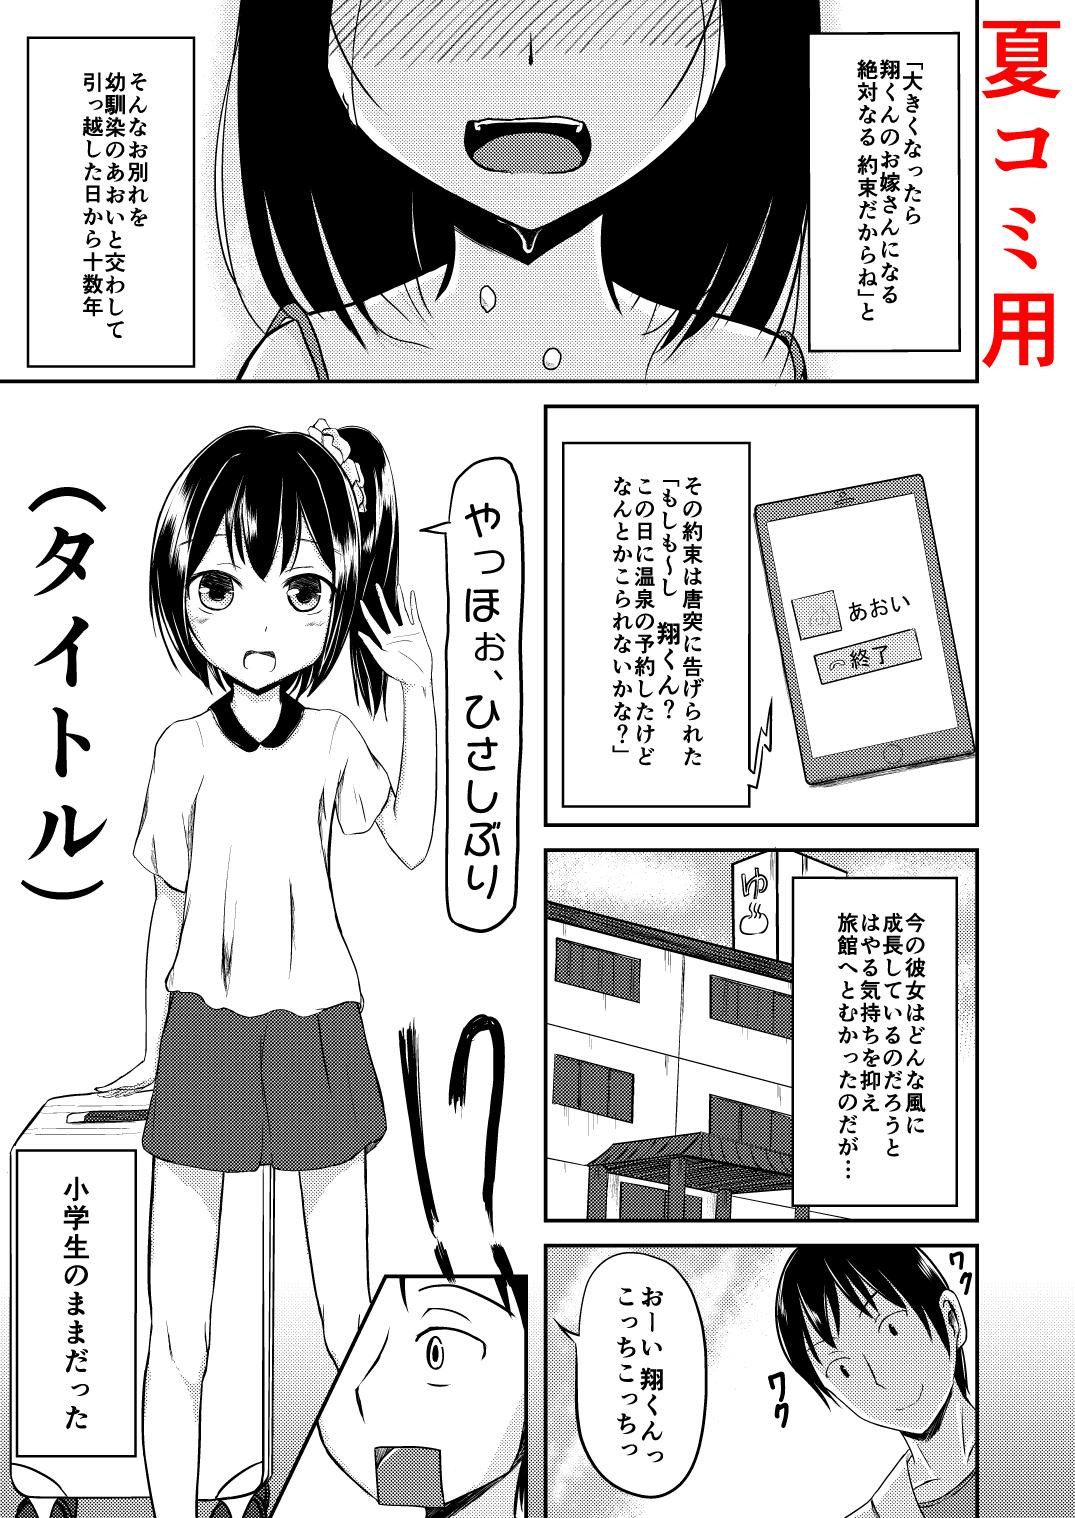 Ookiku Nattara 16